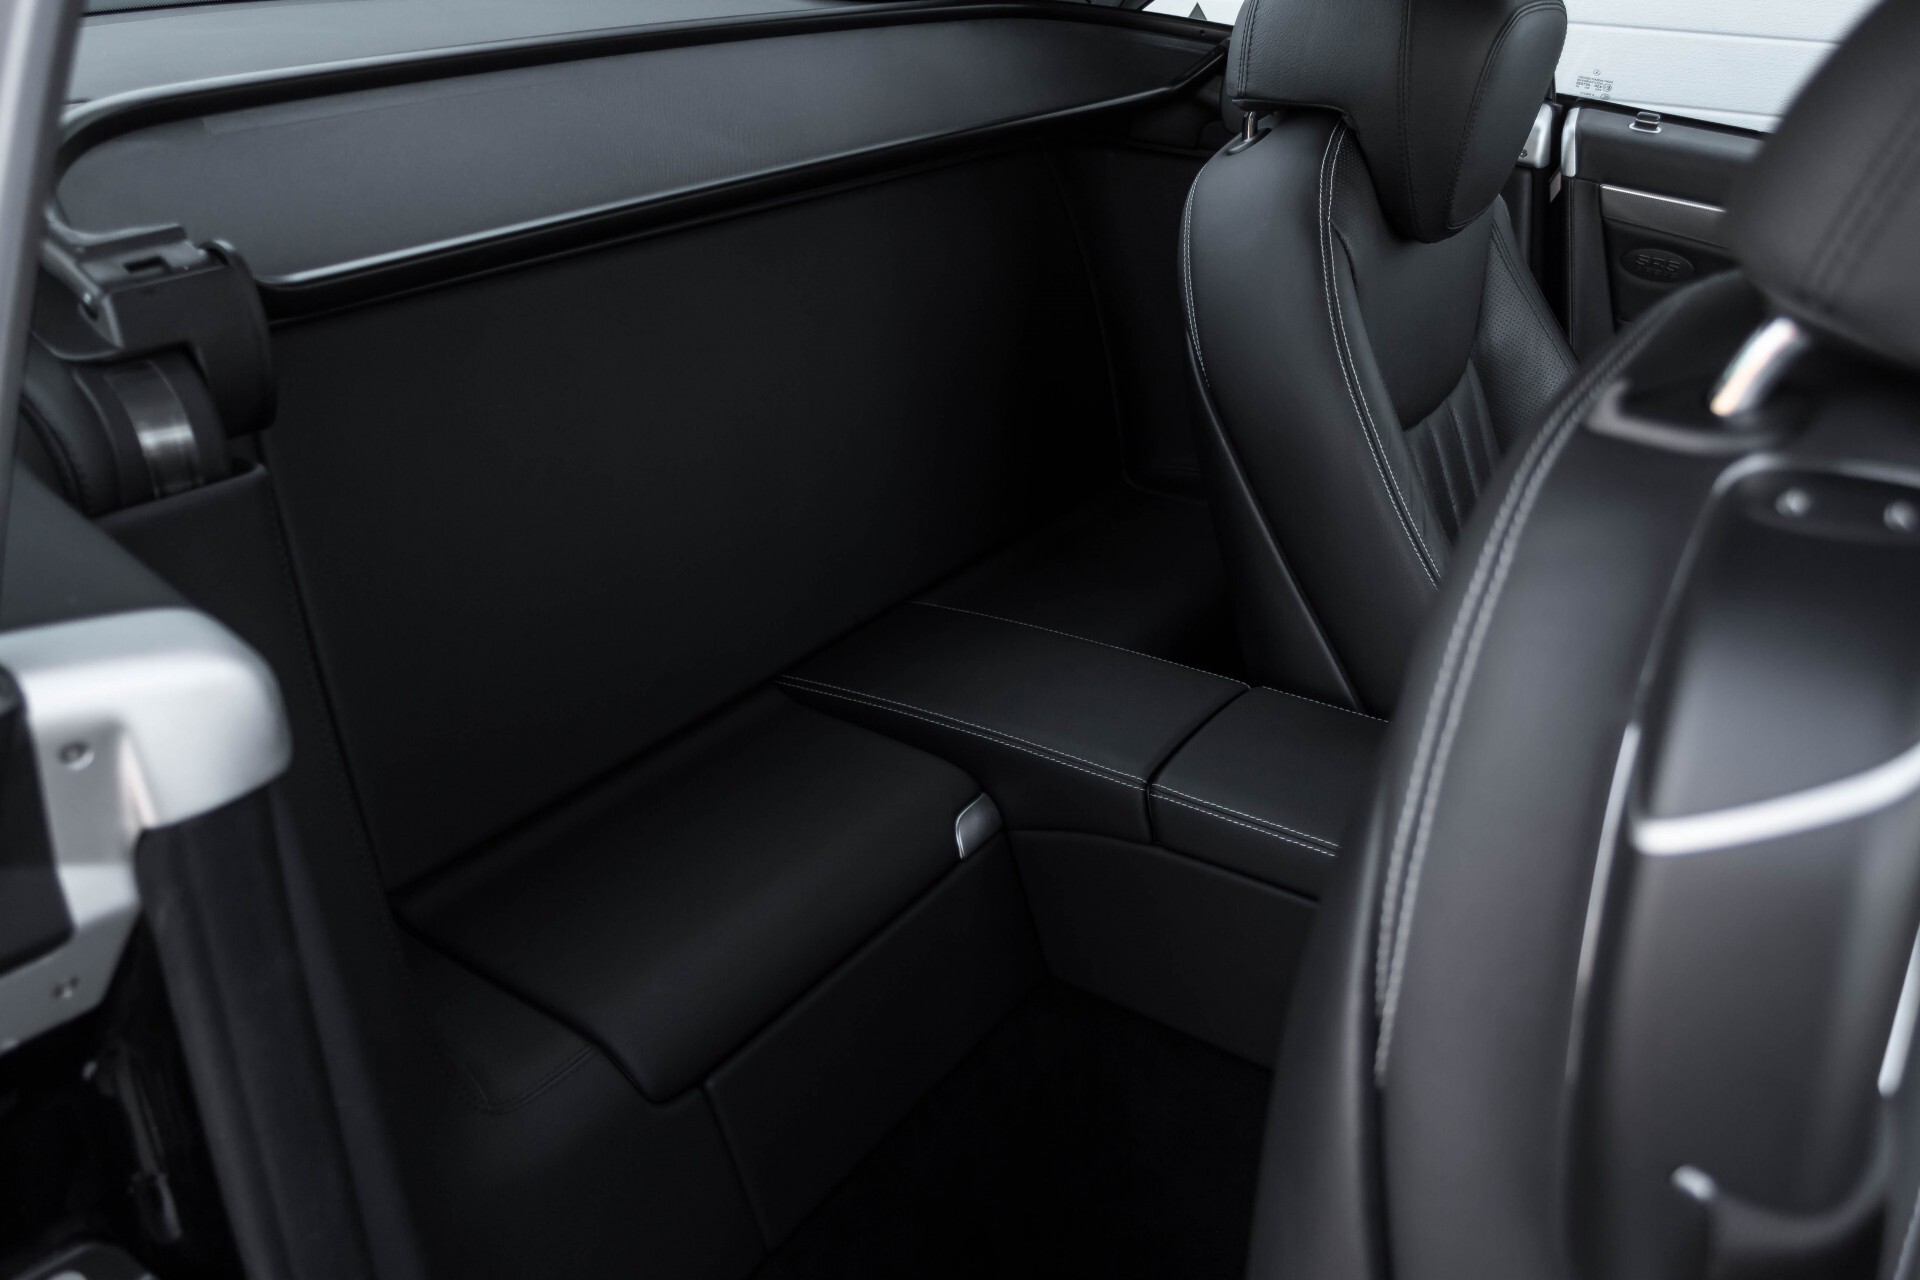 Mercedes-Benz SL-Klasse 500 Sport ABC/Harman-Kardon/Comand/Distronic Aut7 NP €175292 Foto 7